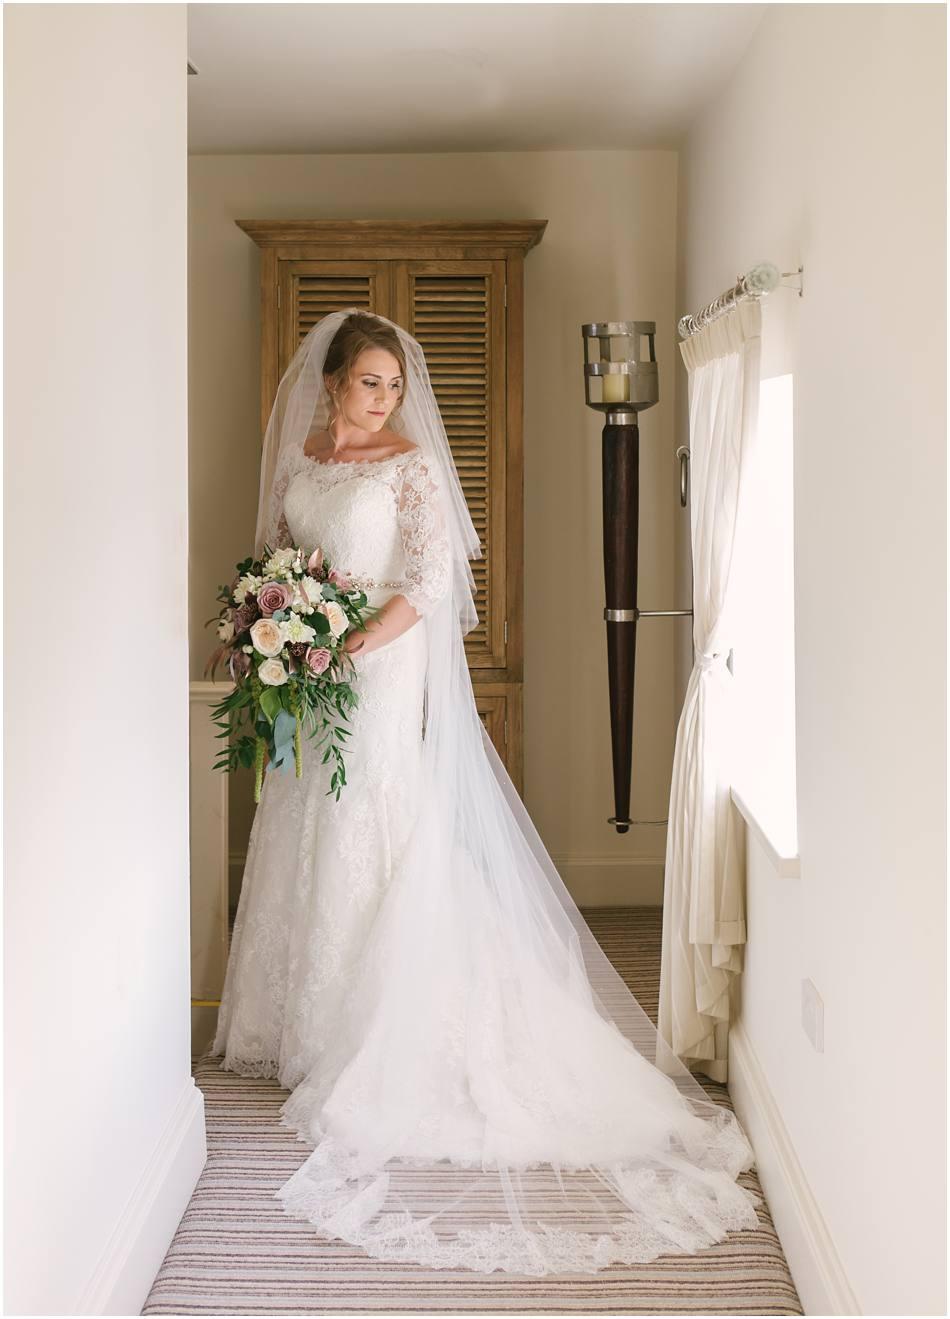 Modern Alrewas Hayes wedding; portrait of a Bride wearing a long sleeved lace wedding dress